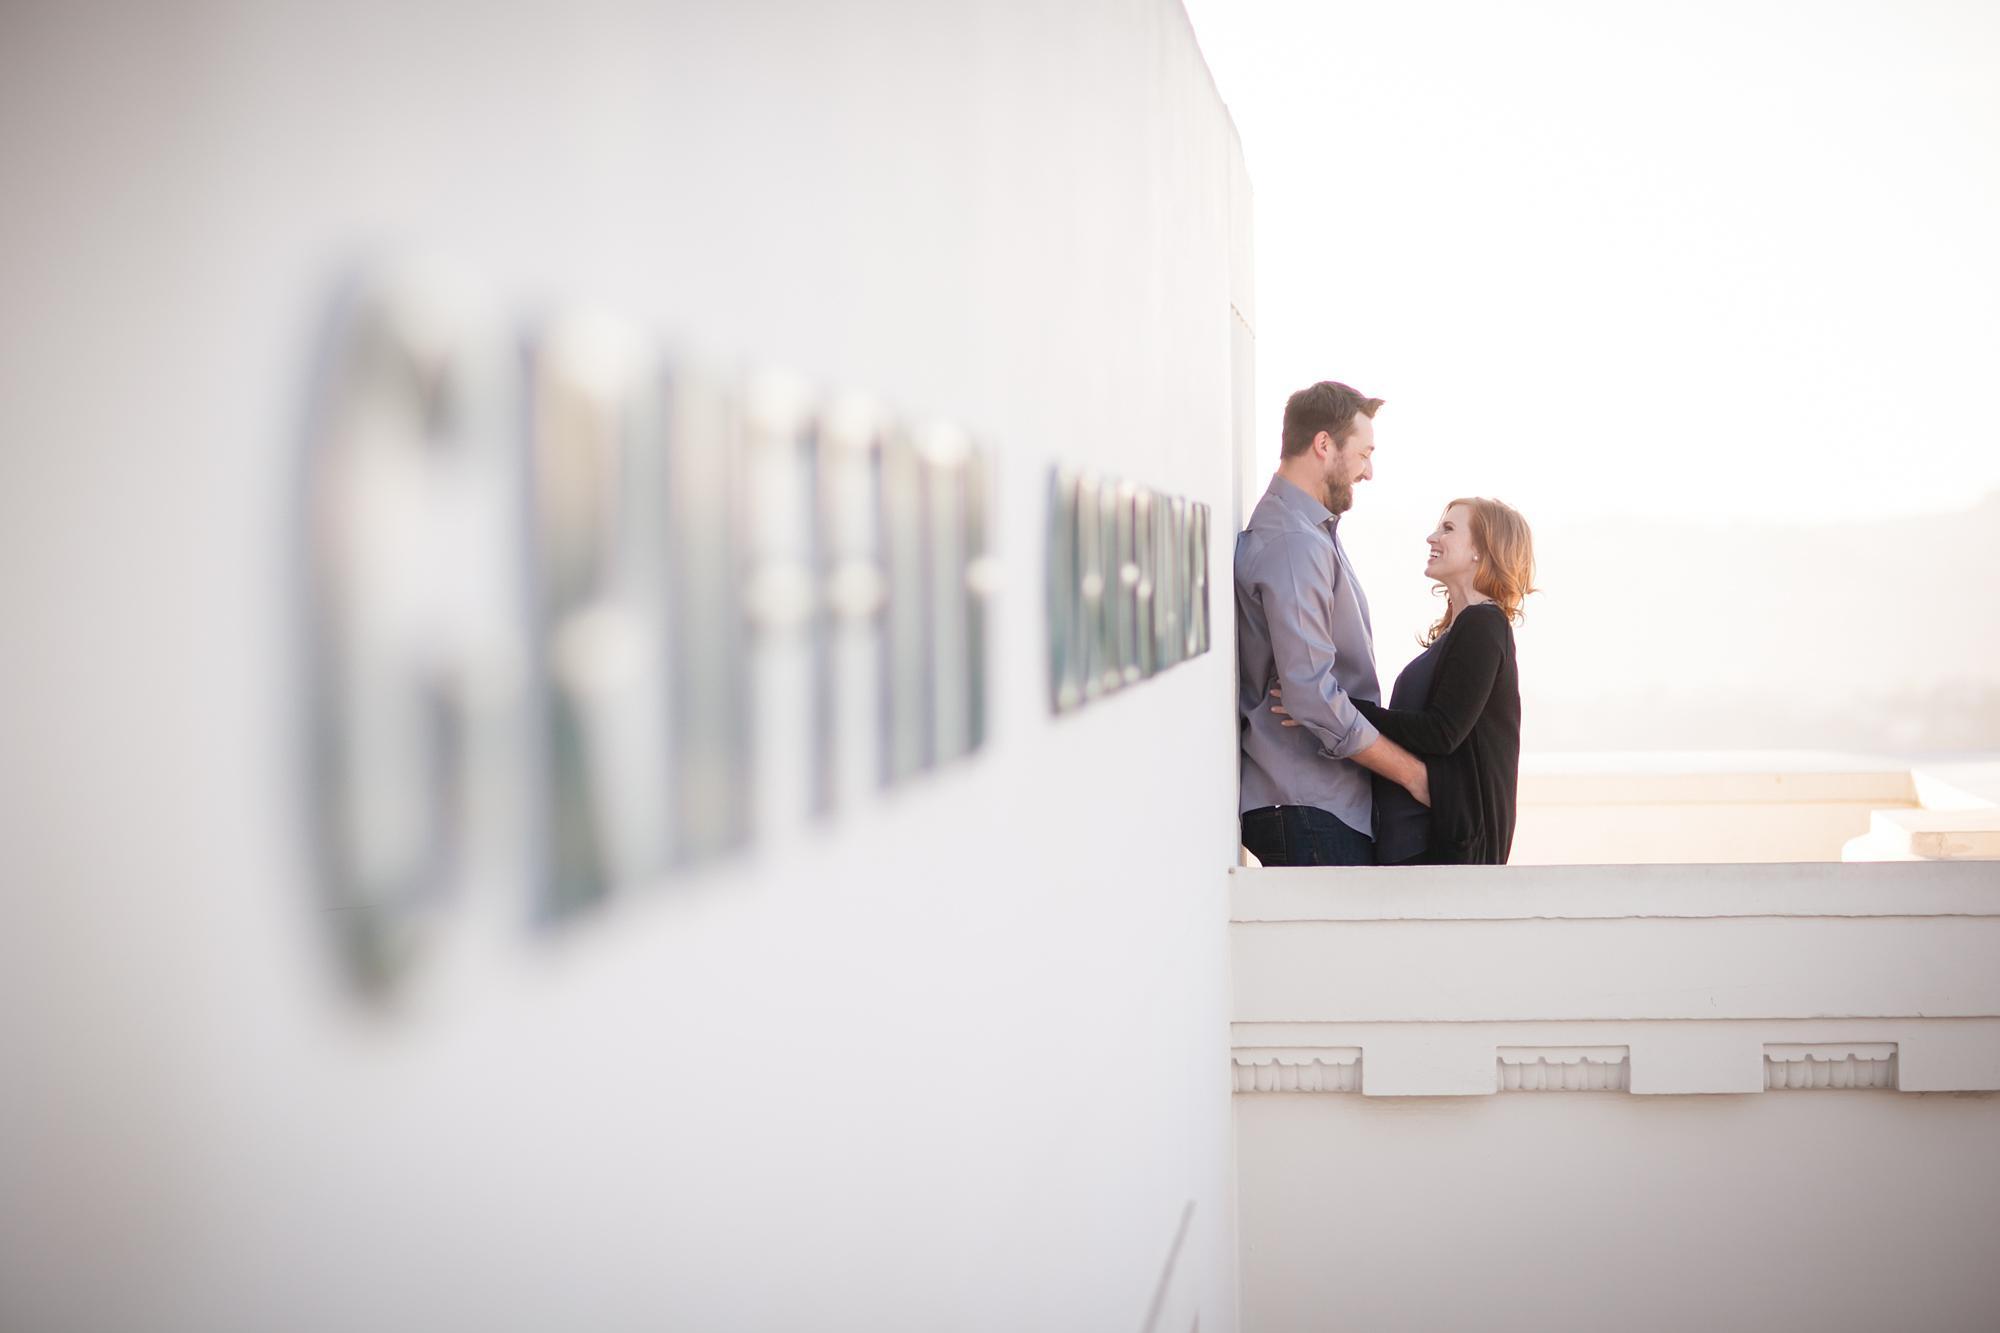 Griffith Observatory Engagement | Miki & Sonja Photography | mikiandsonja.com